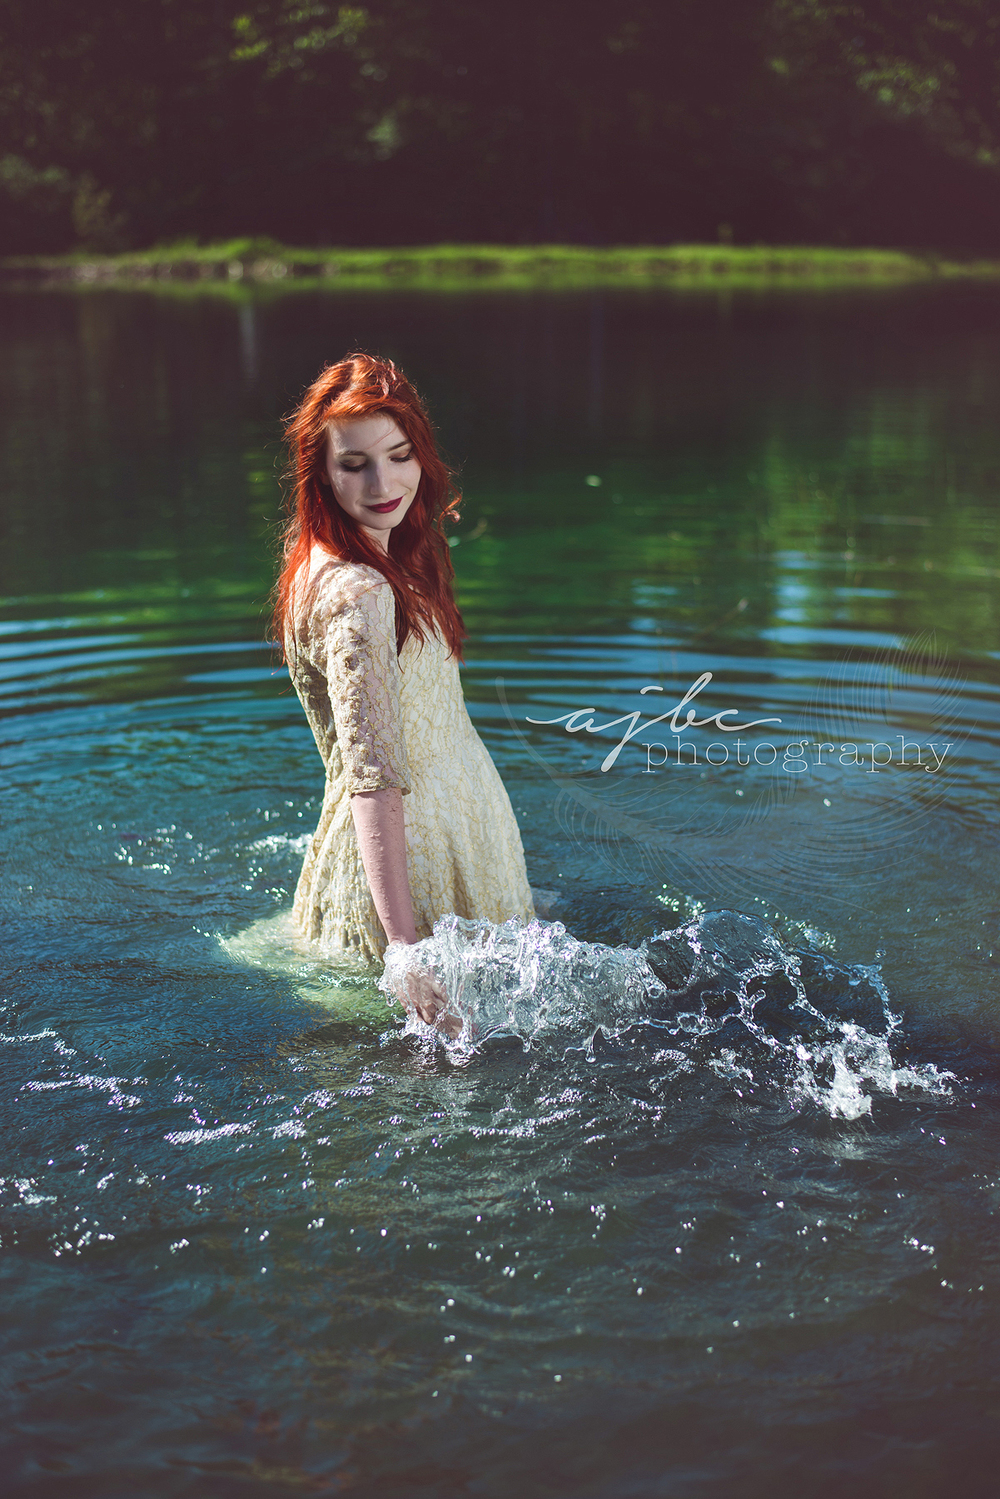 playful water pond AJBC Photography Fine Art Port Huron Beauty Photographer 15.jpg